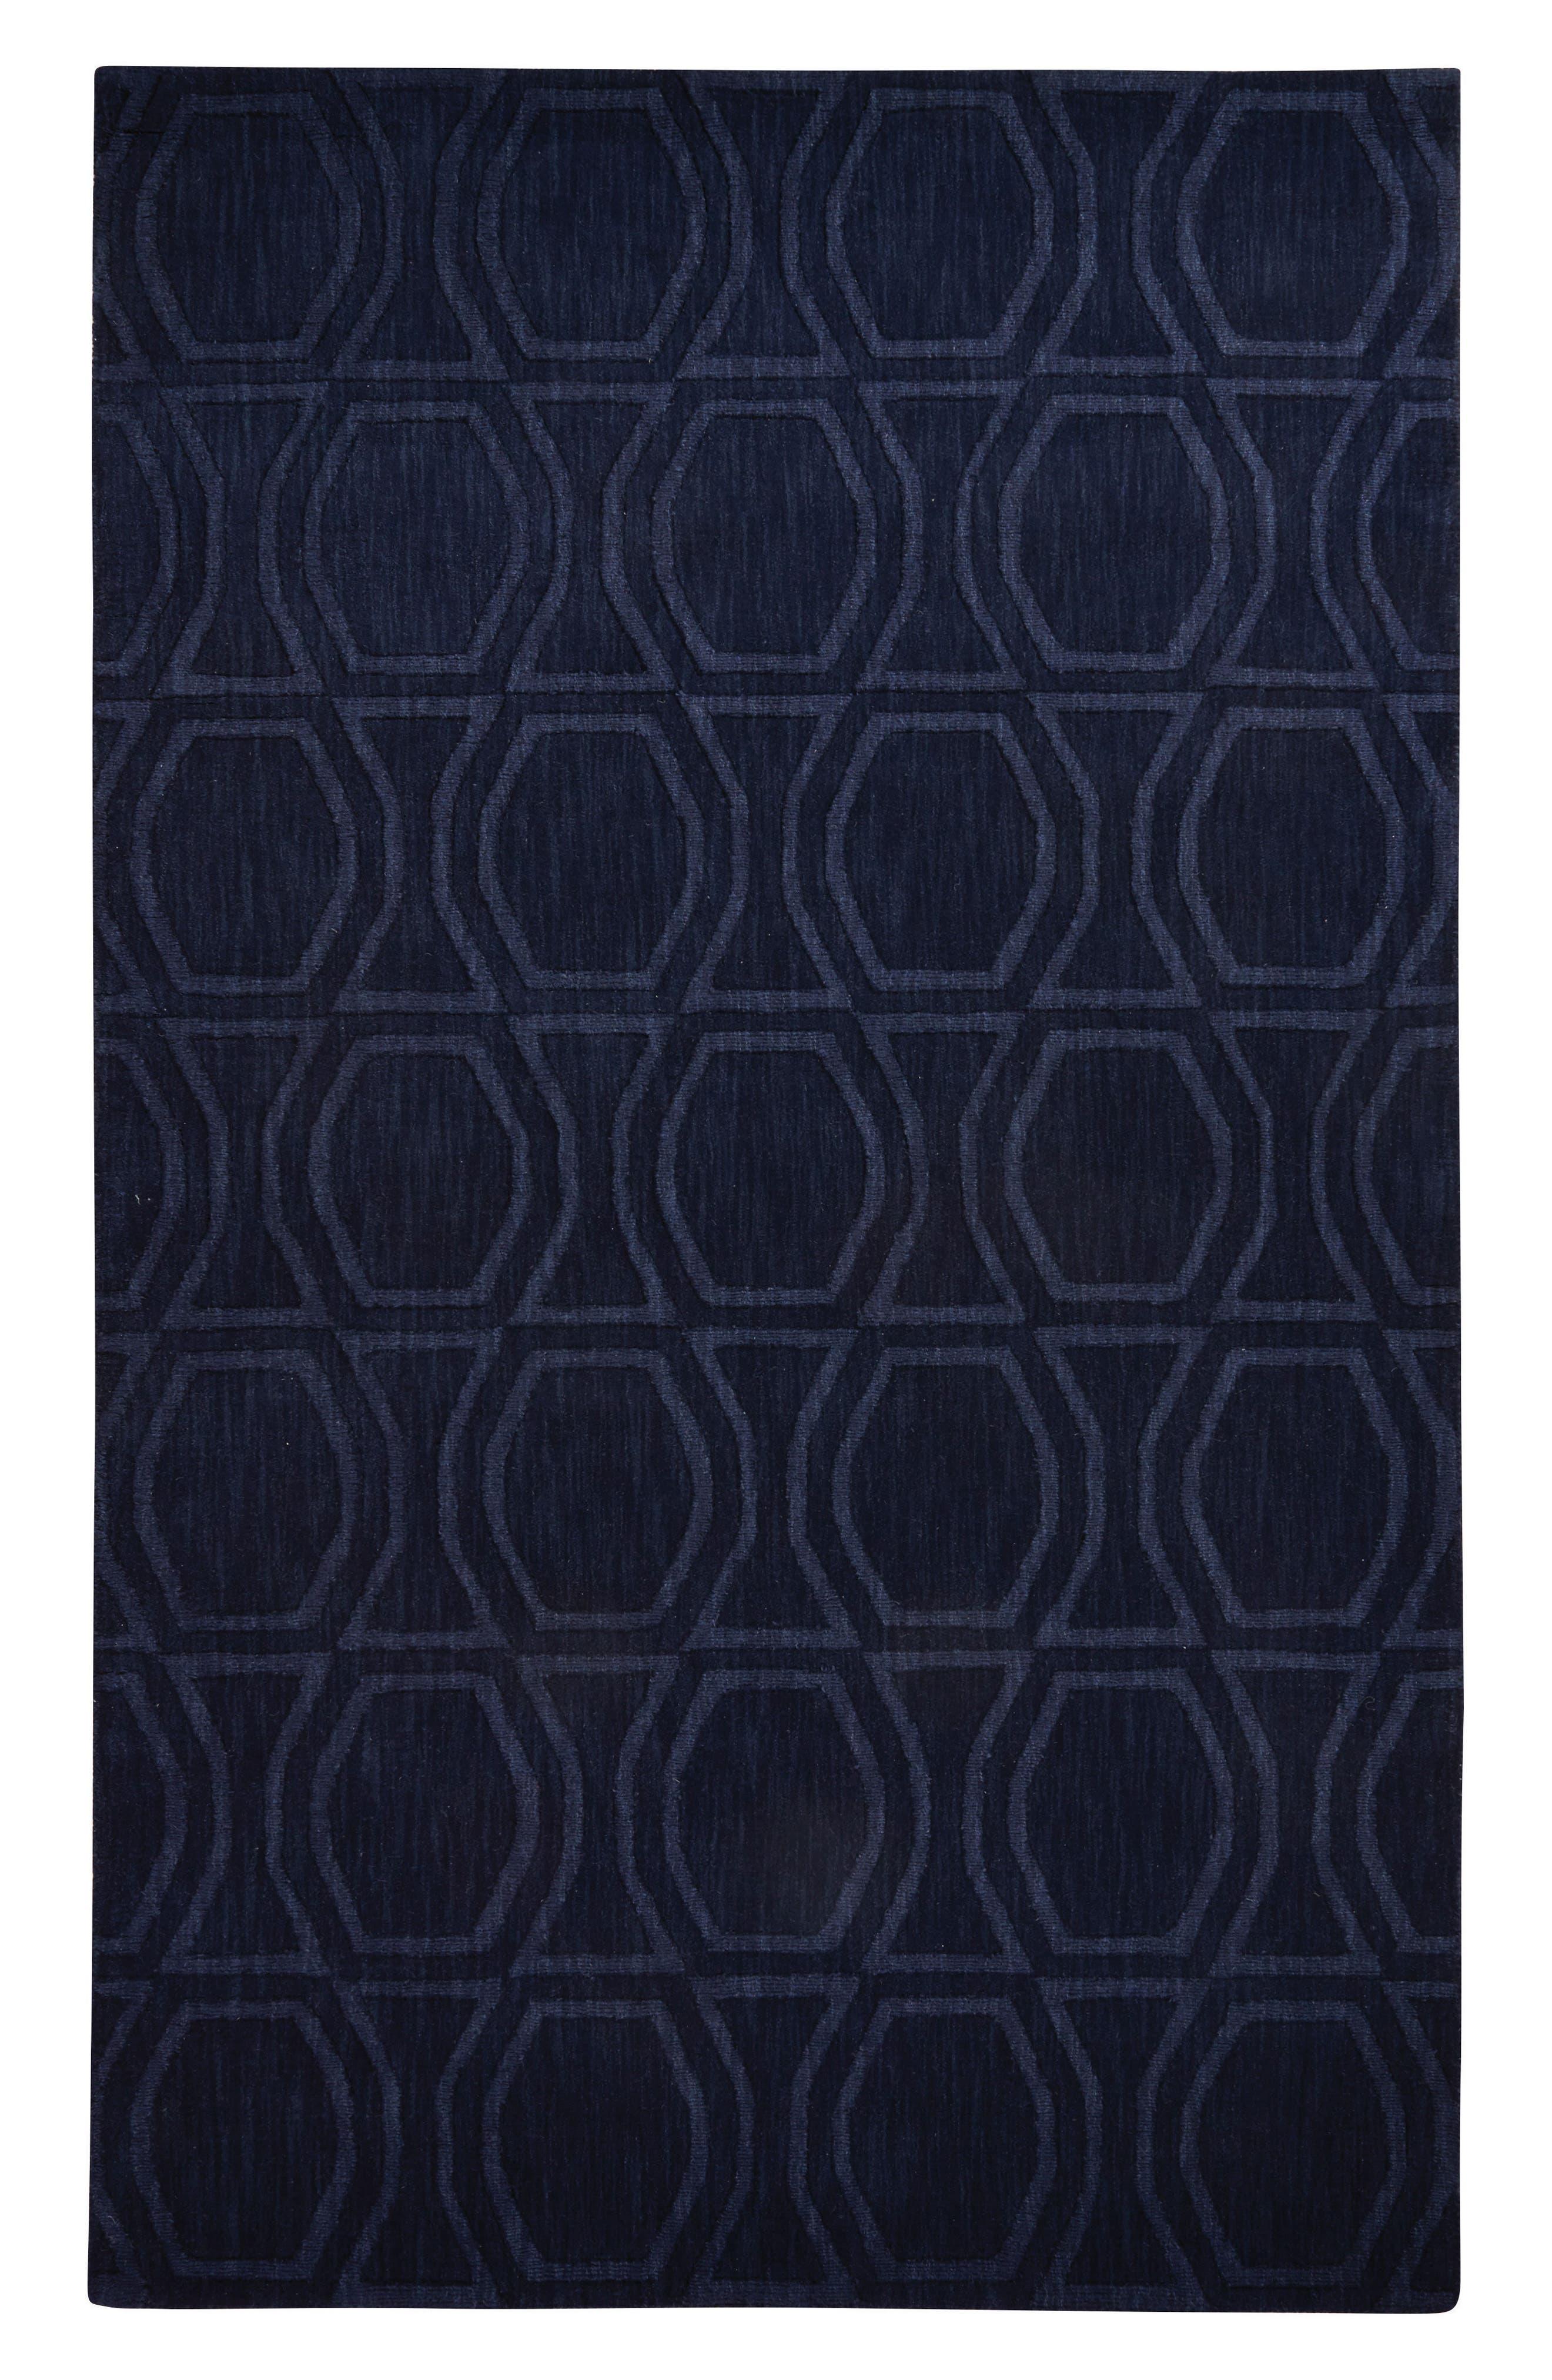 'astor' wool rug,                             Alternate thumbnail 12, color,